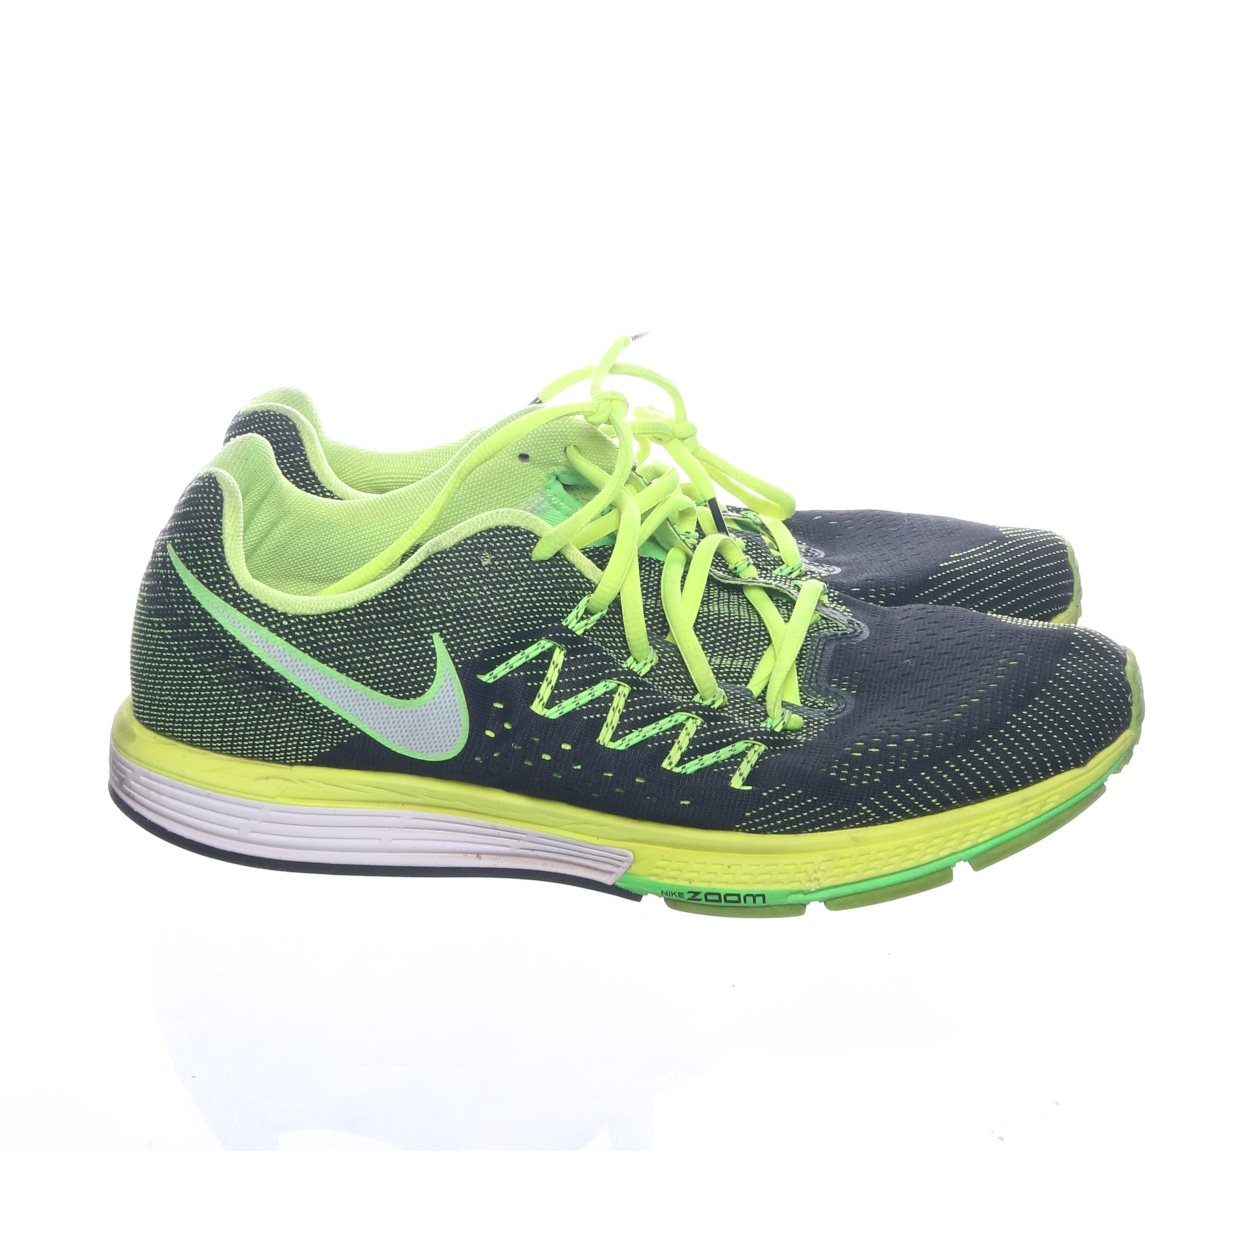 the latest d8371 489a3 Nike, Löparskor, Strl  42.5, Zoom Vomero 10, Grön Svart